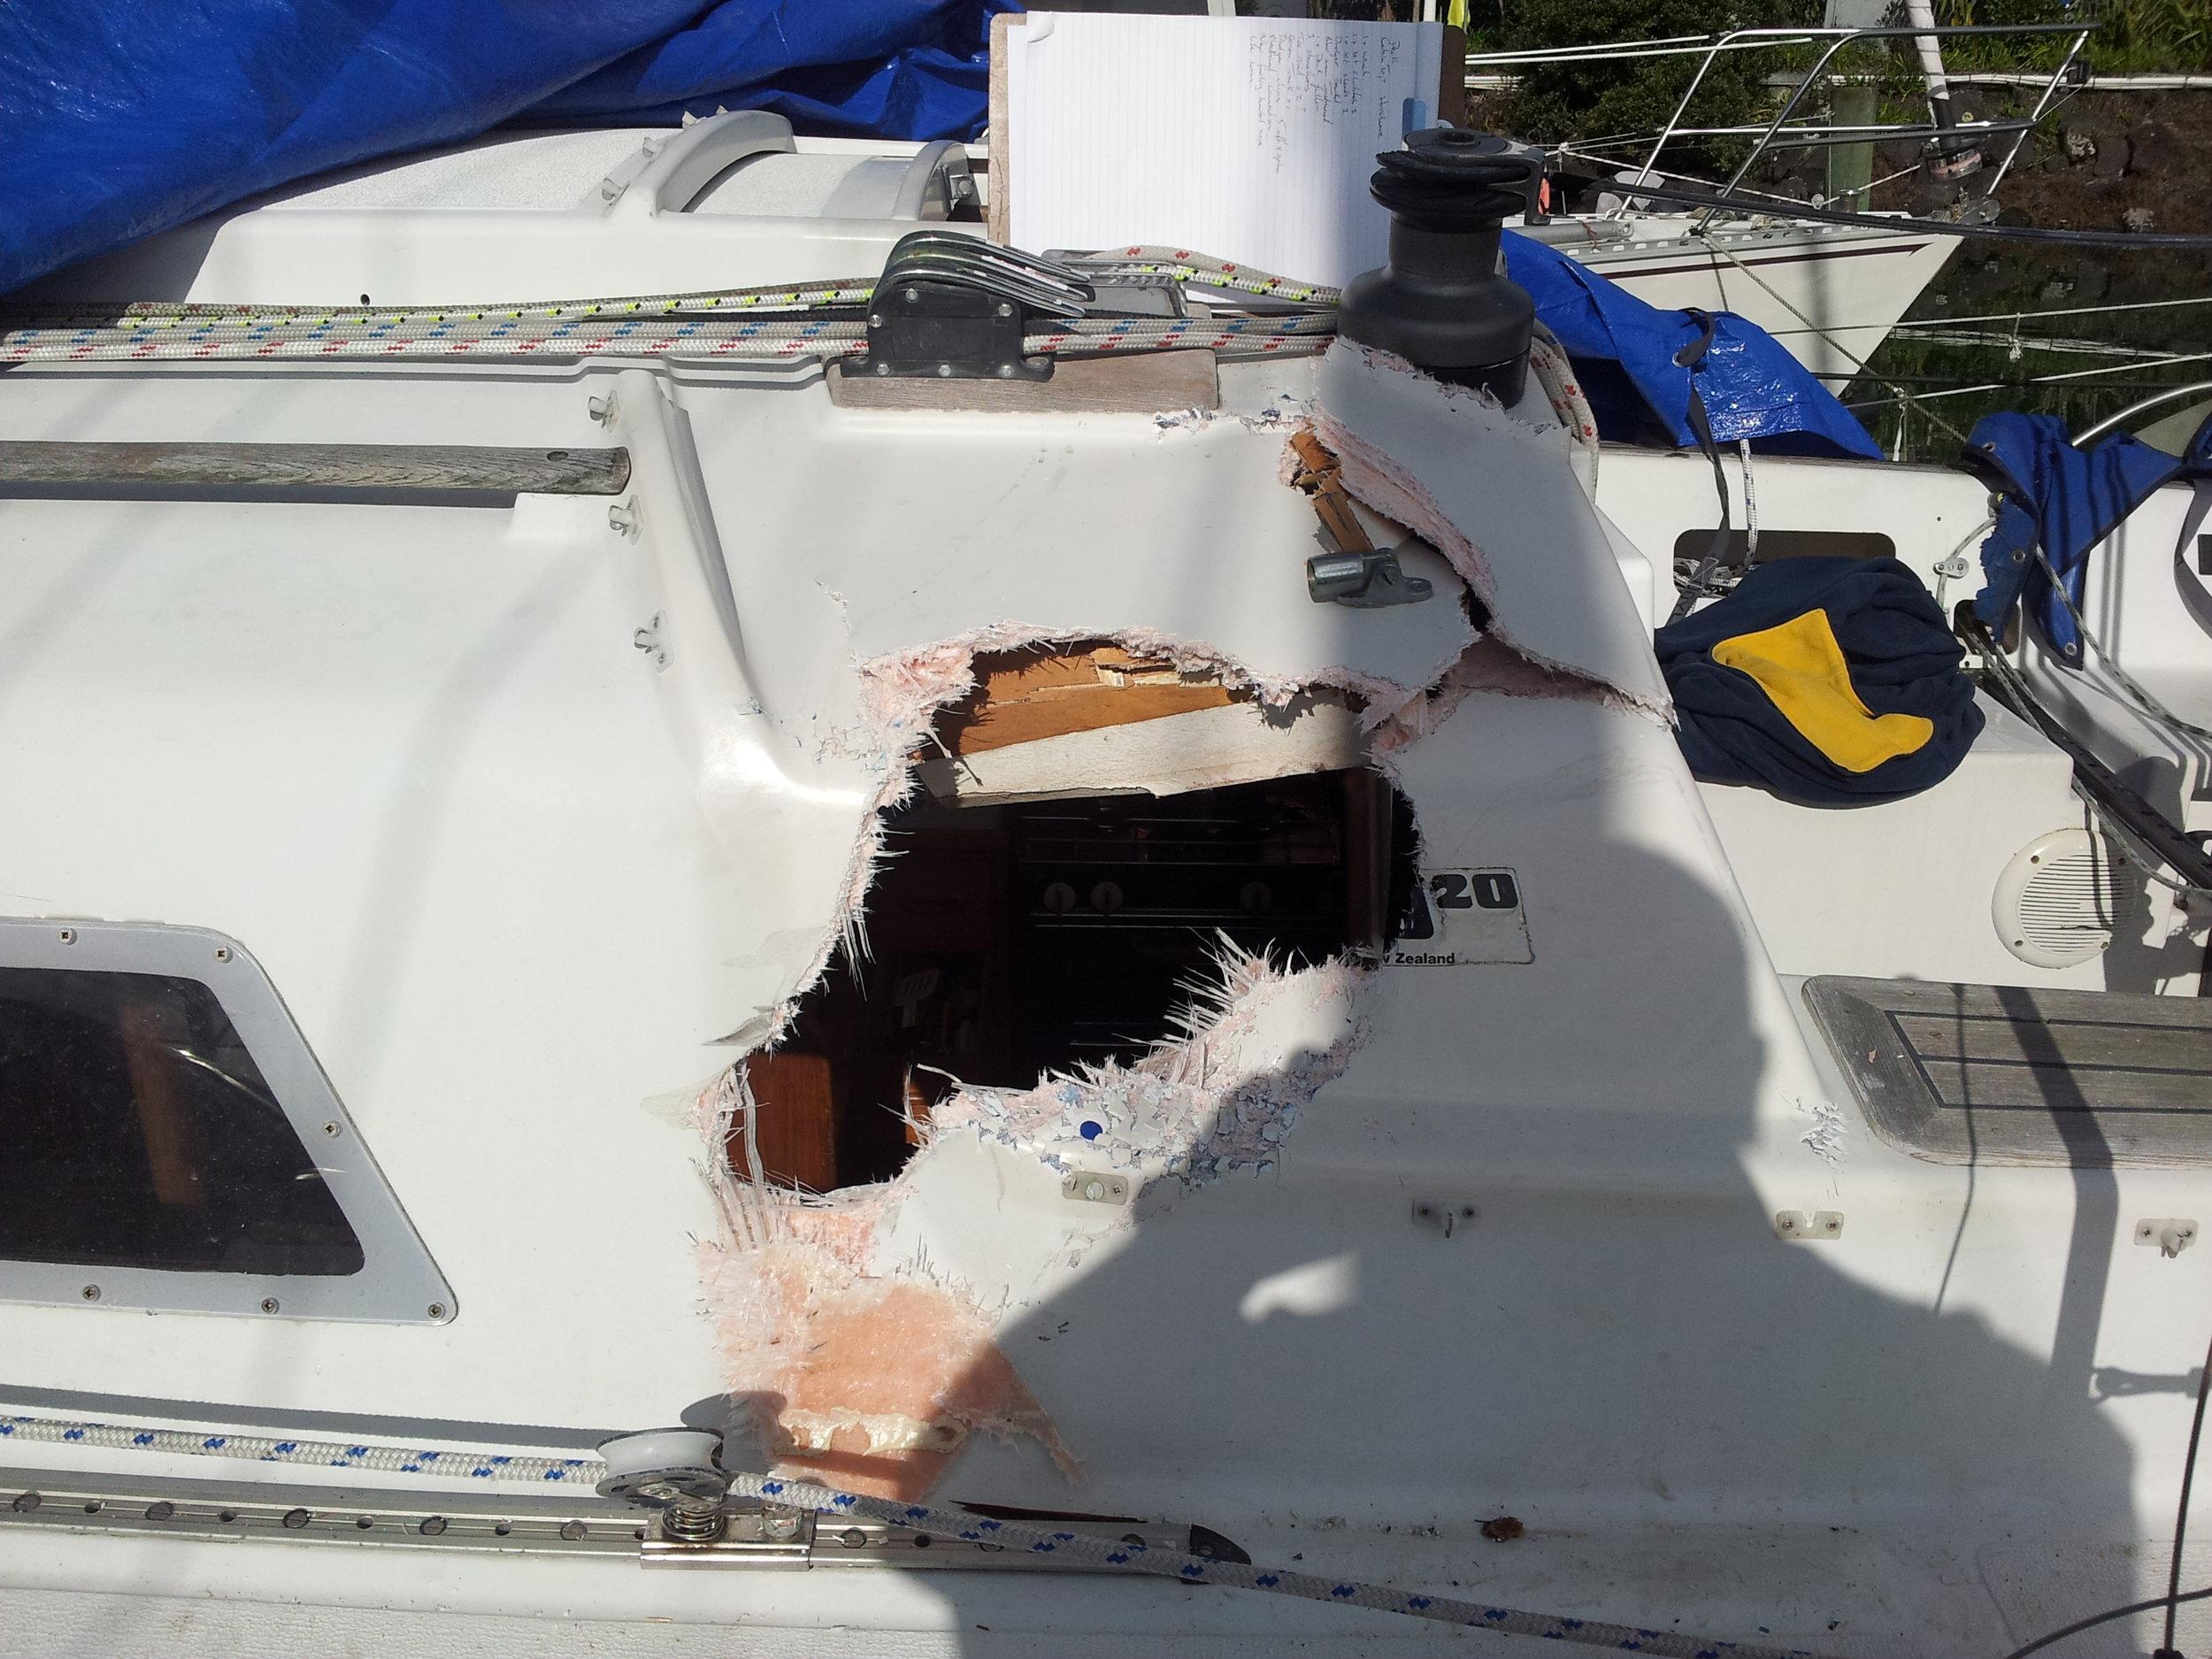 180411 BK Collision repair 1.jpg